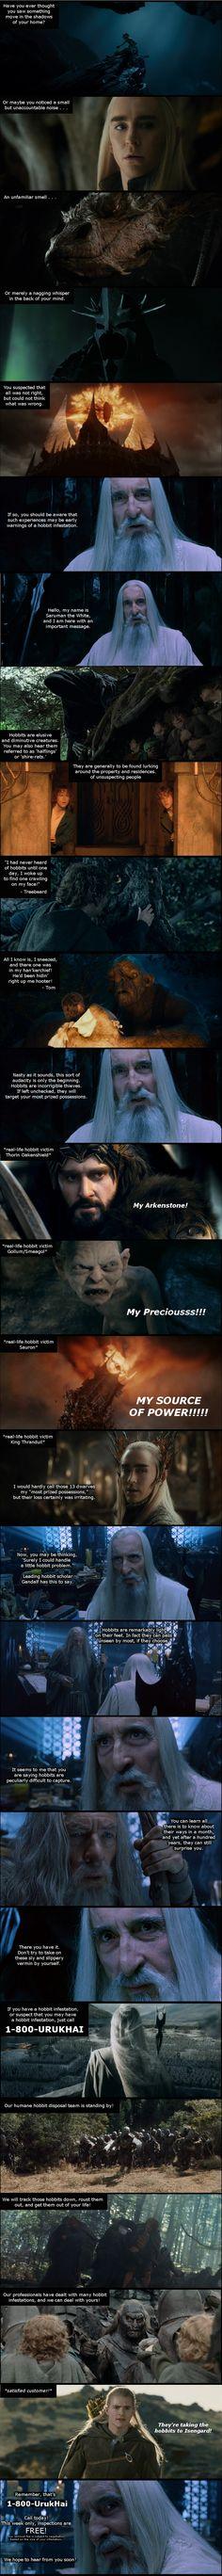 Hobbit Infestation Infomercial by ttanner2448 on DeviantArt <--- This is hilarious!!